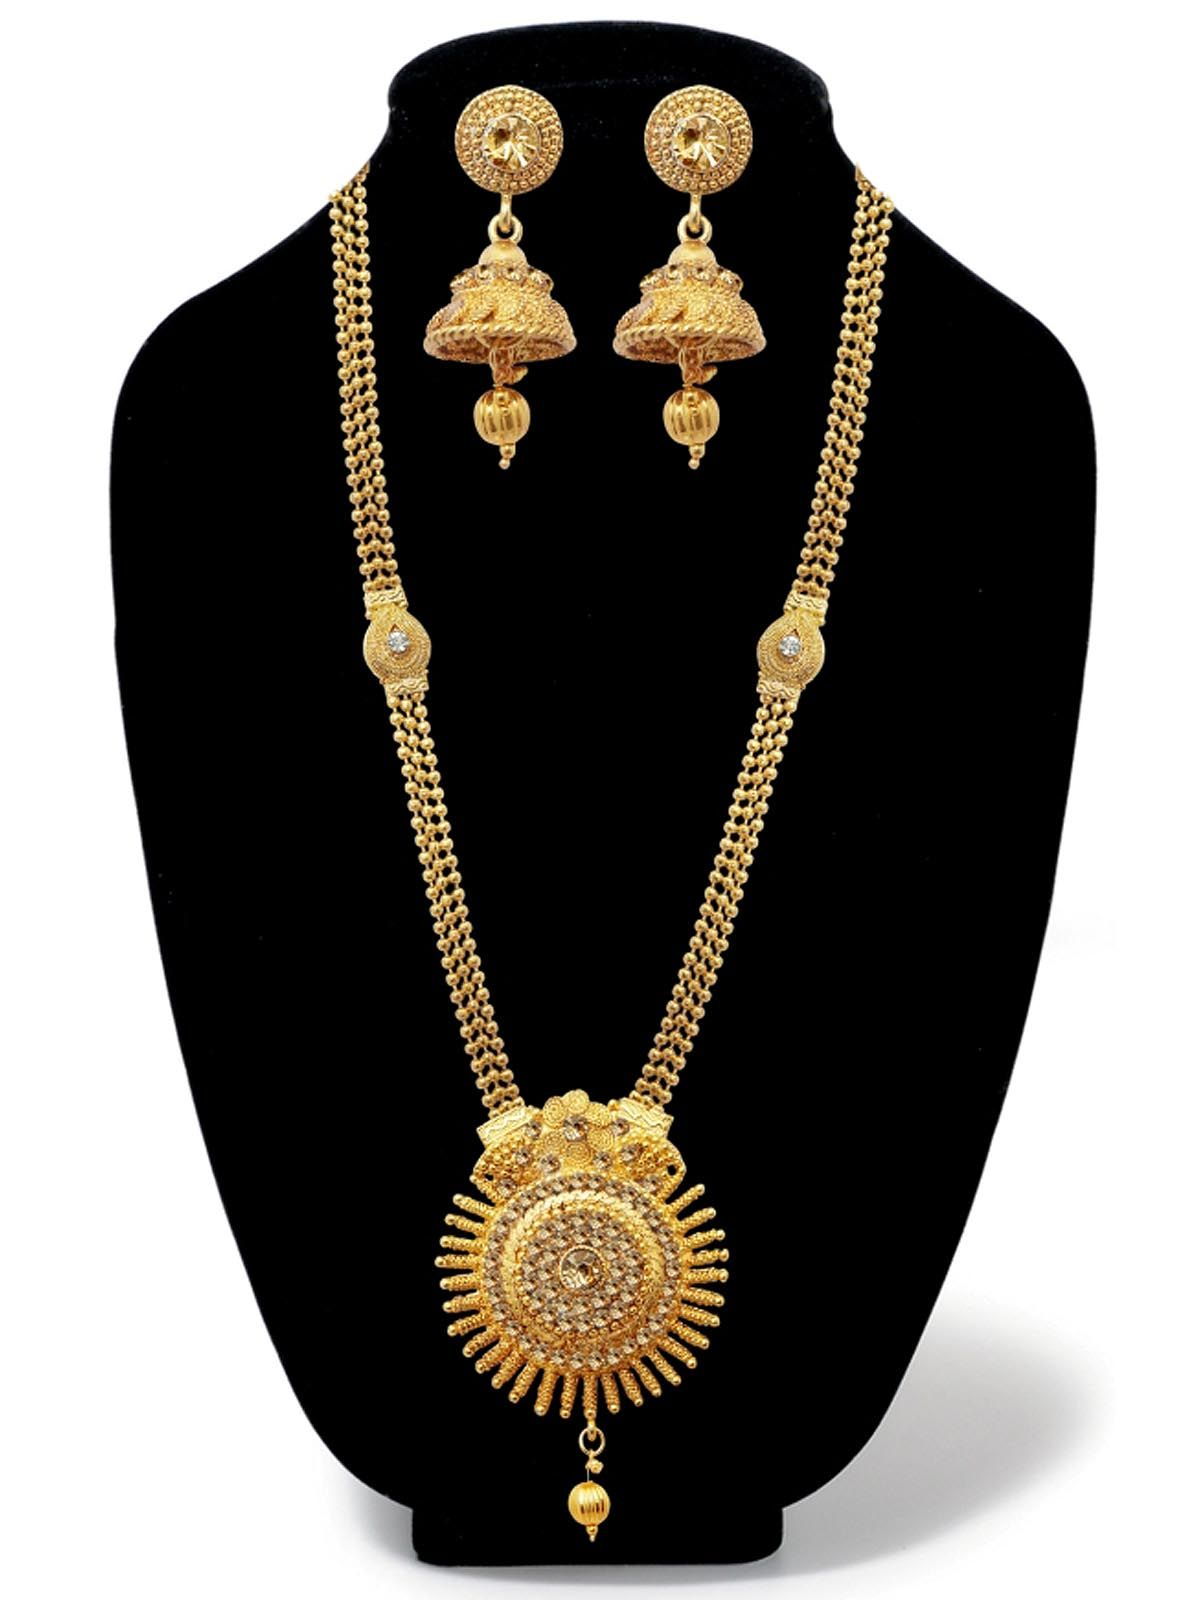 Genial Vintage Golden Austrian Stone Wedding Wear Jewellery Set 1 Perhiasan Rhodium Gives You An Alluring Look In